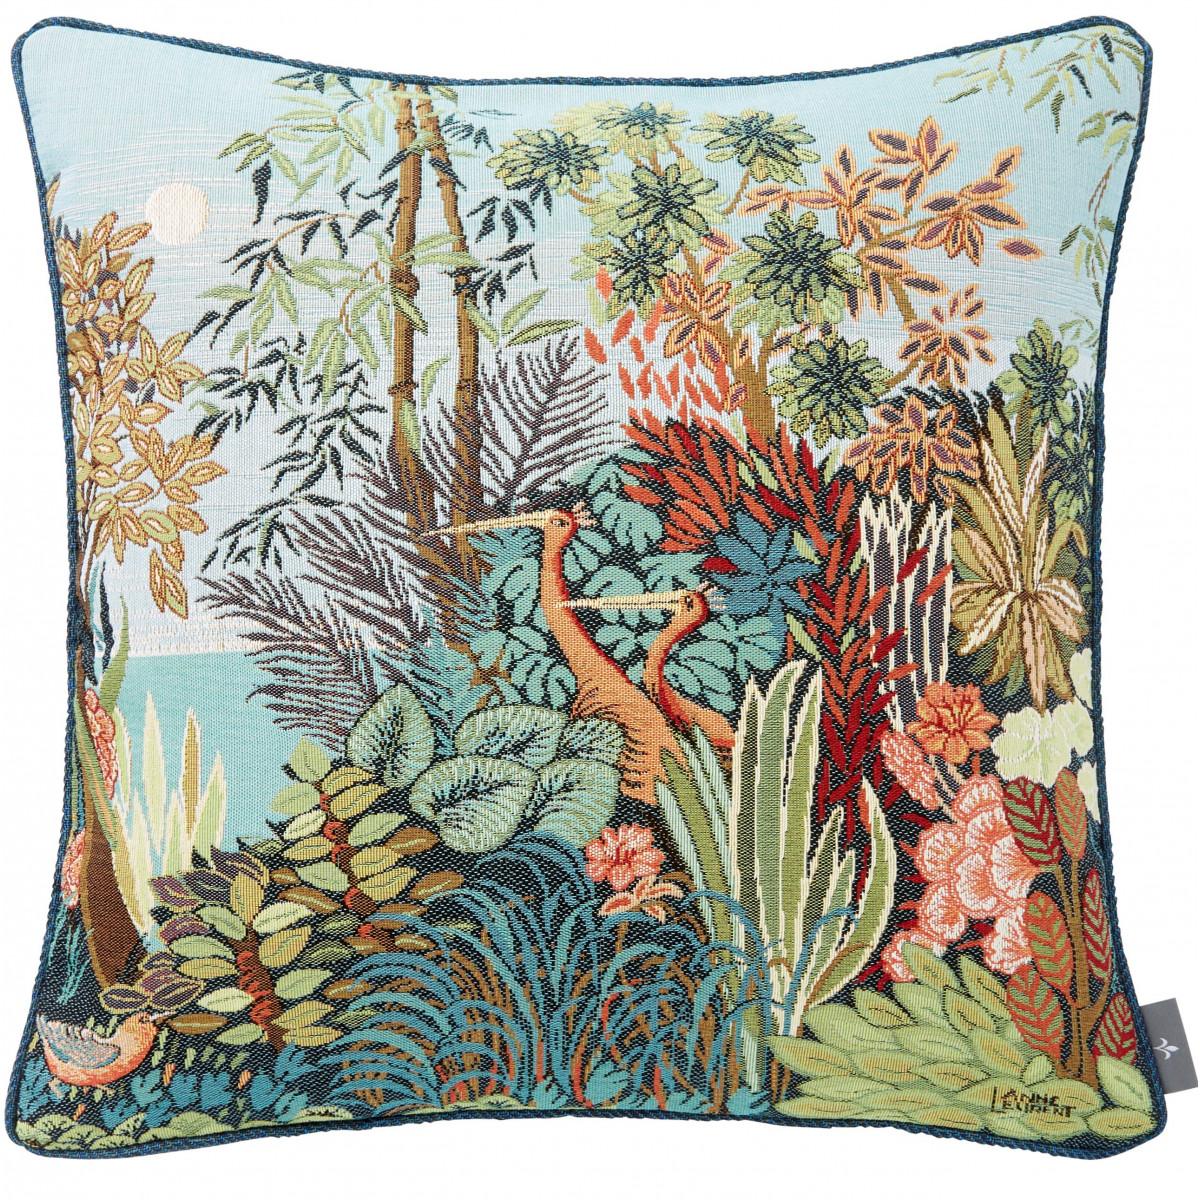 Coussin tapisserie oiseaux en forêt made in france bleu   50x50